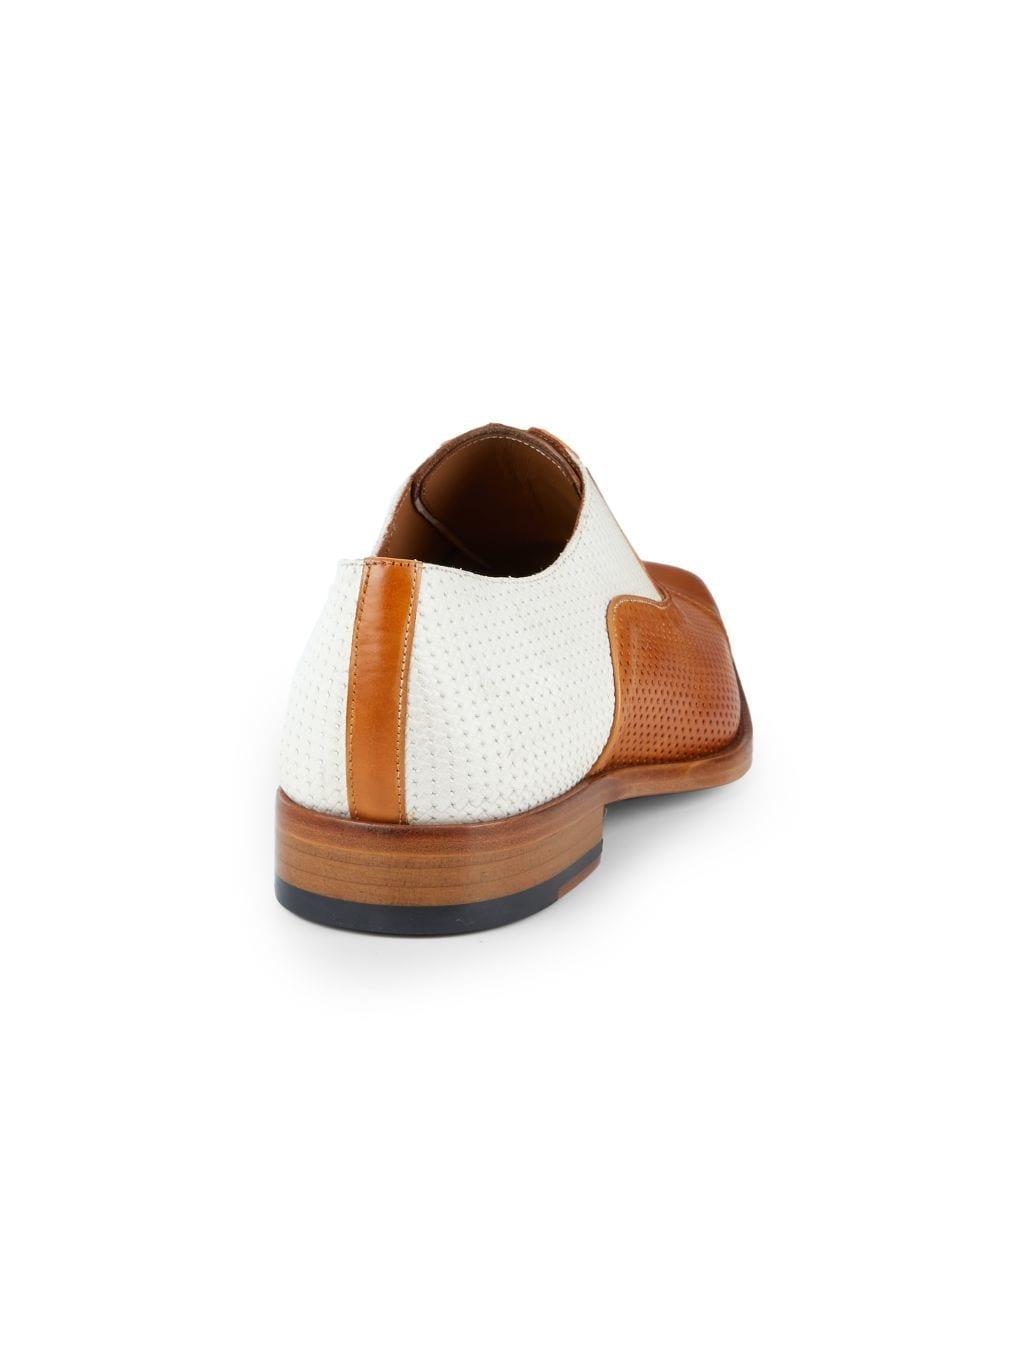 Mezlan Two-Tone Perforation Leather Oxfords